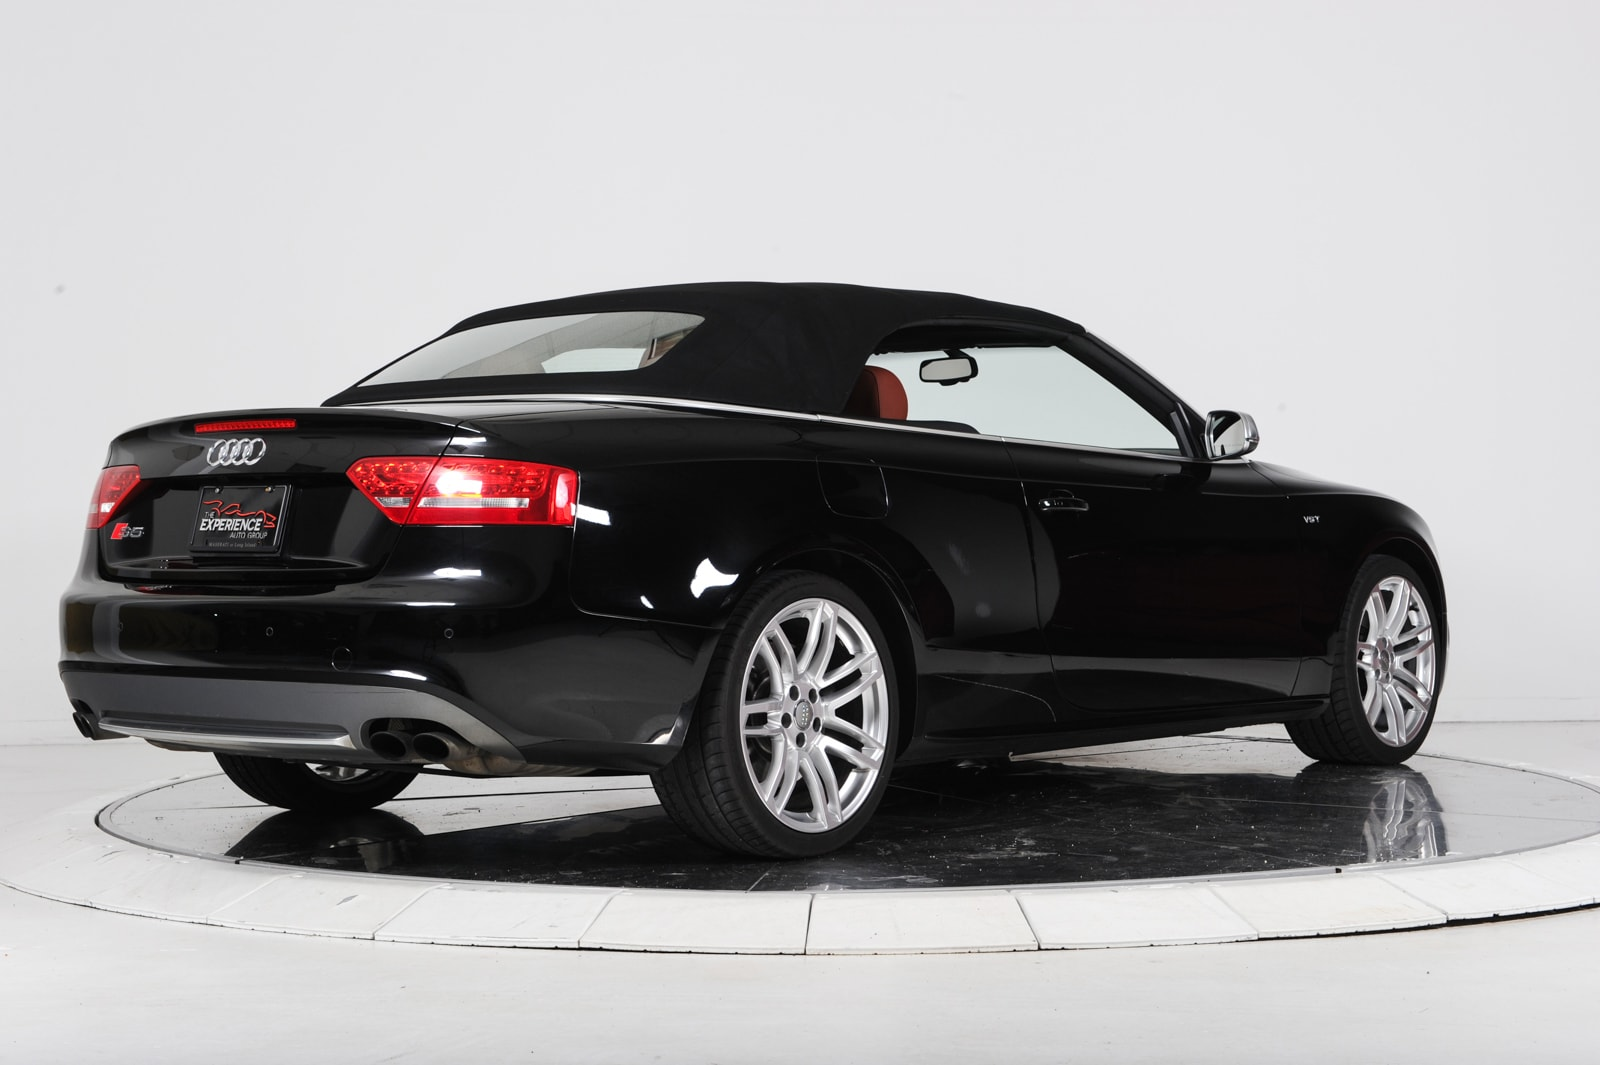 used 2012 audi s5 cabriolet for sale plainview near long. Black Bedroom Furniture Sets. Home Design Ideas